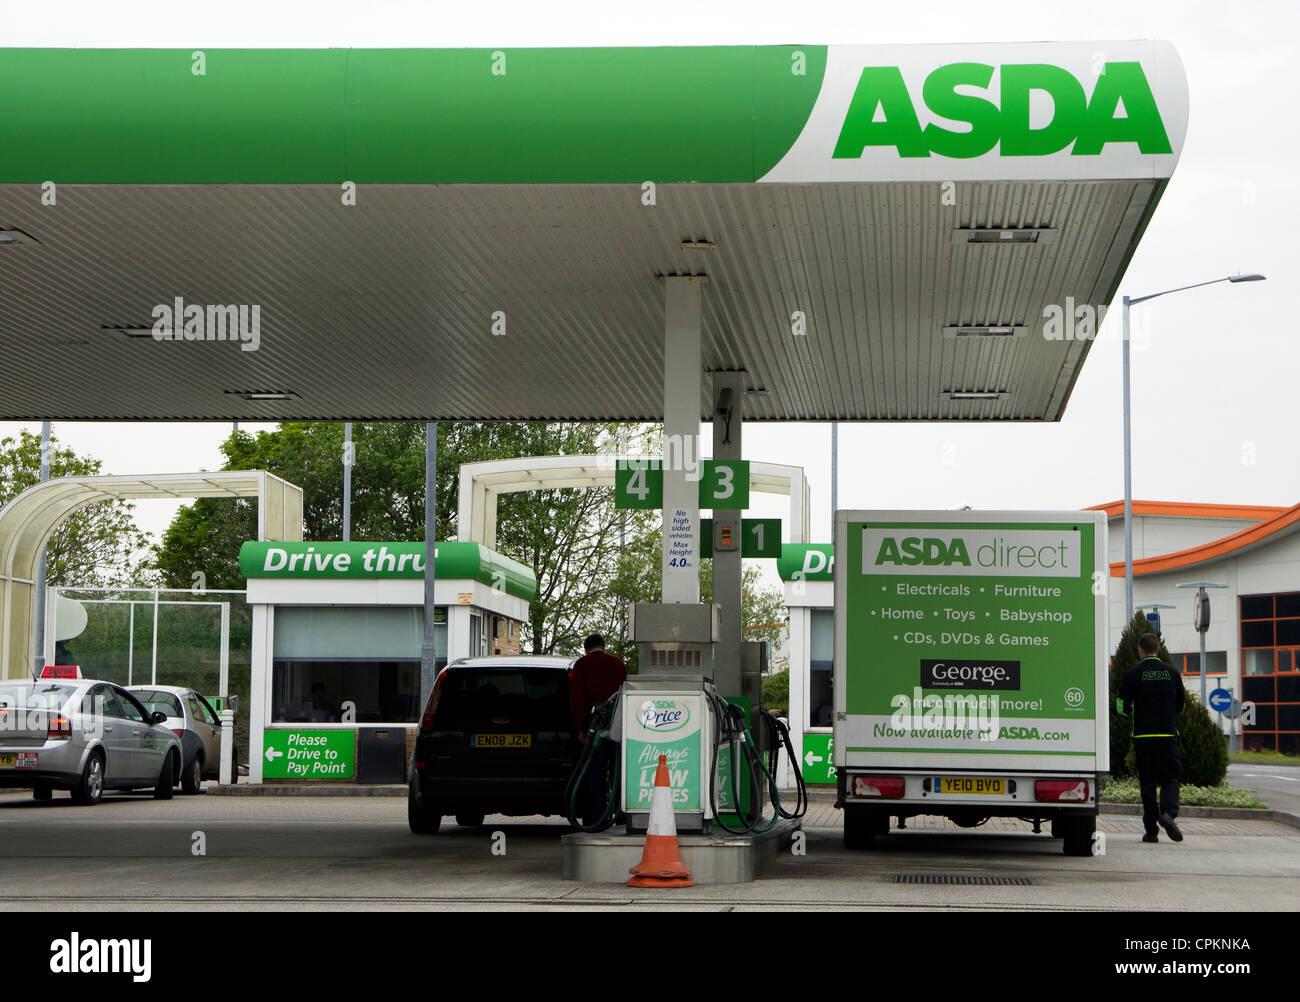 An Asda petrol station forecourt, cornwall, uk - Stock Image